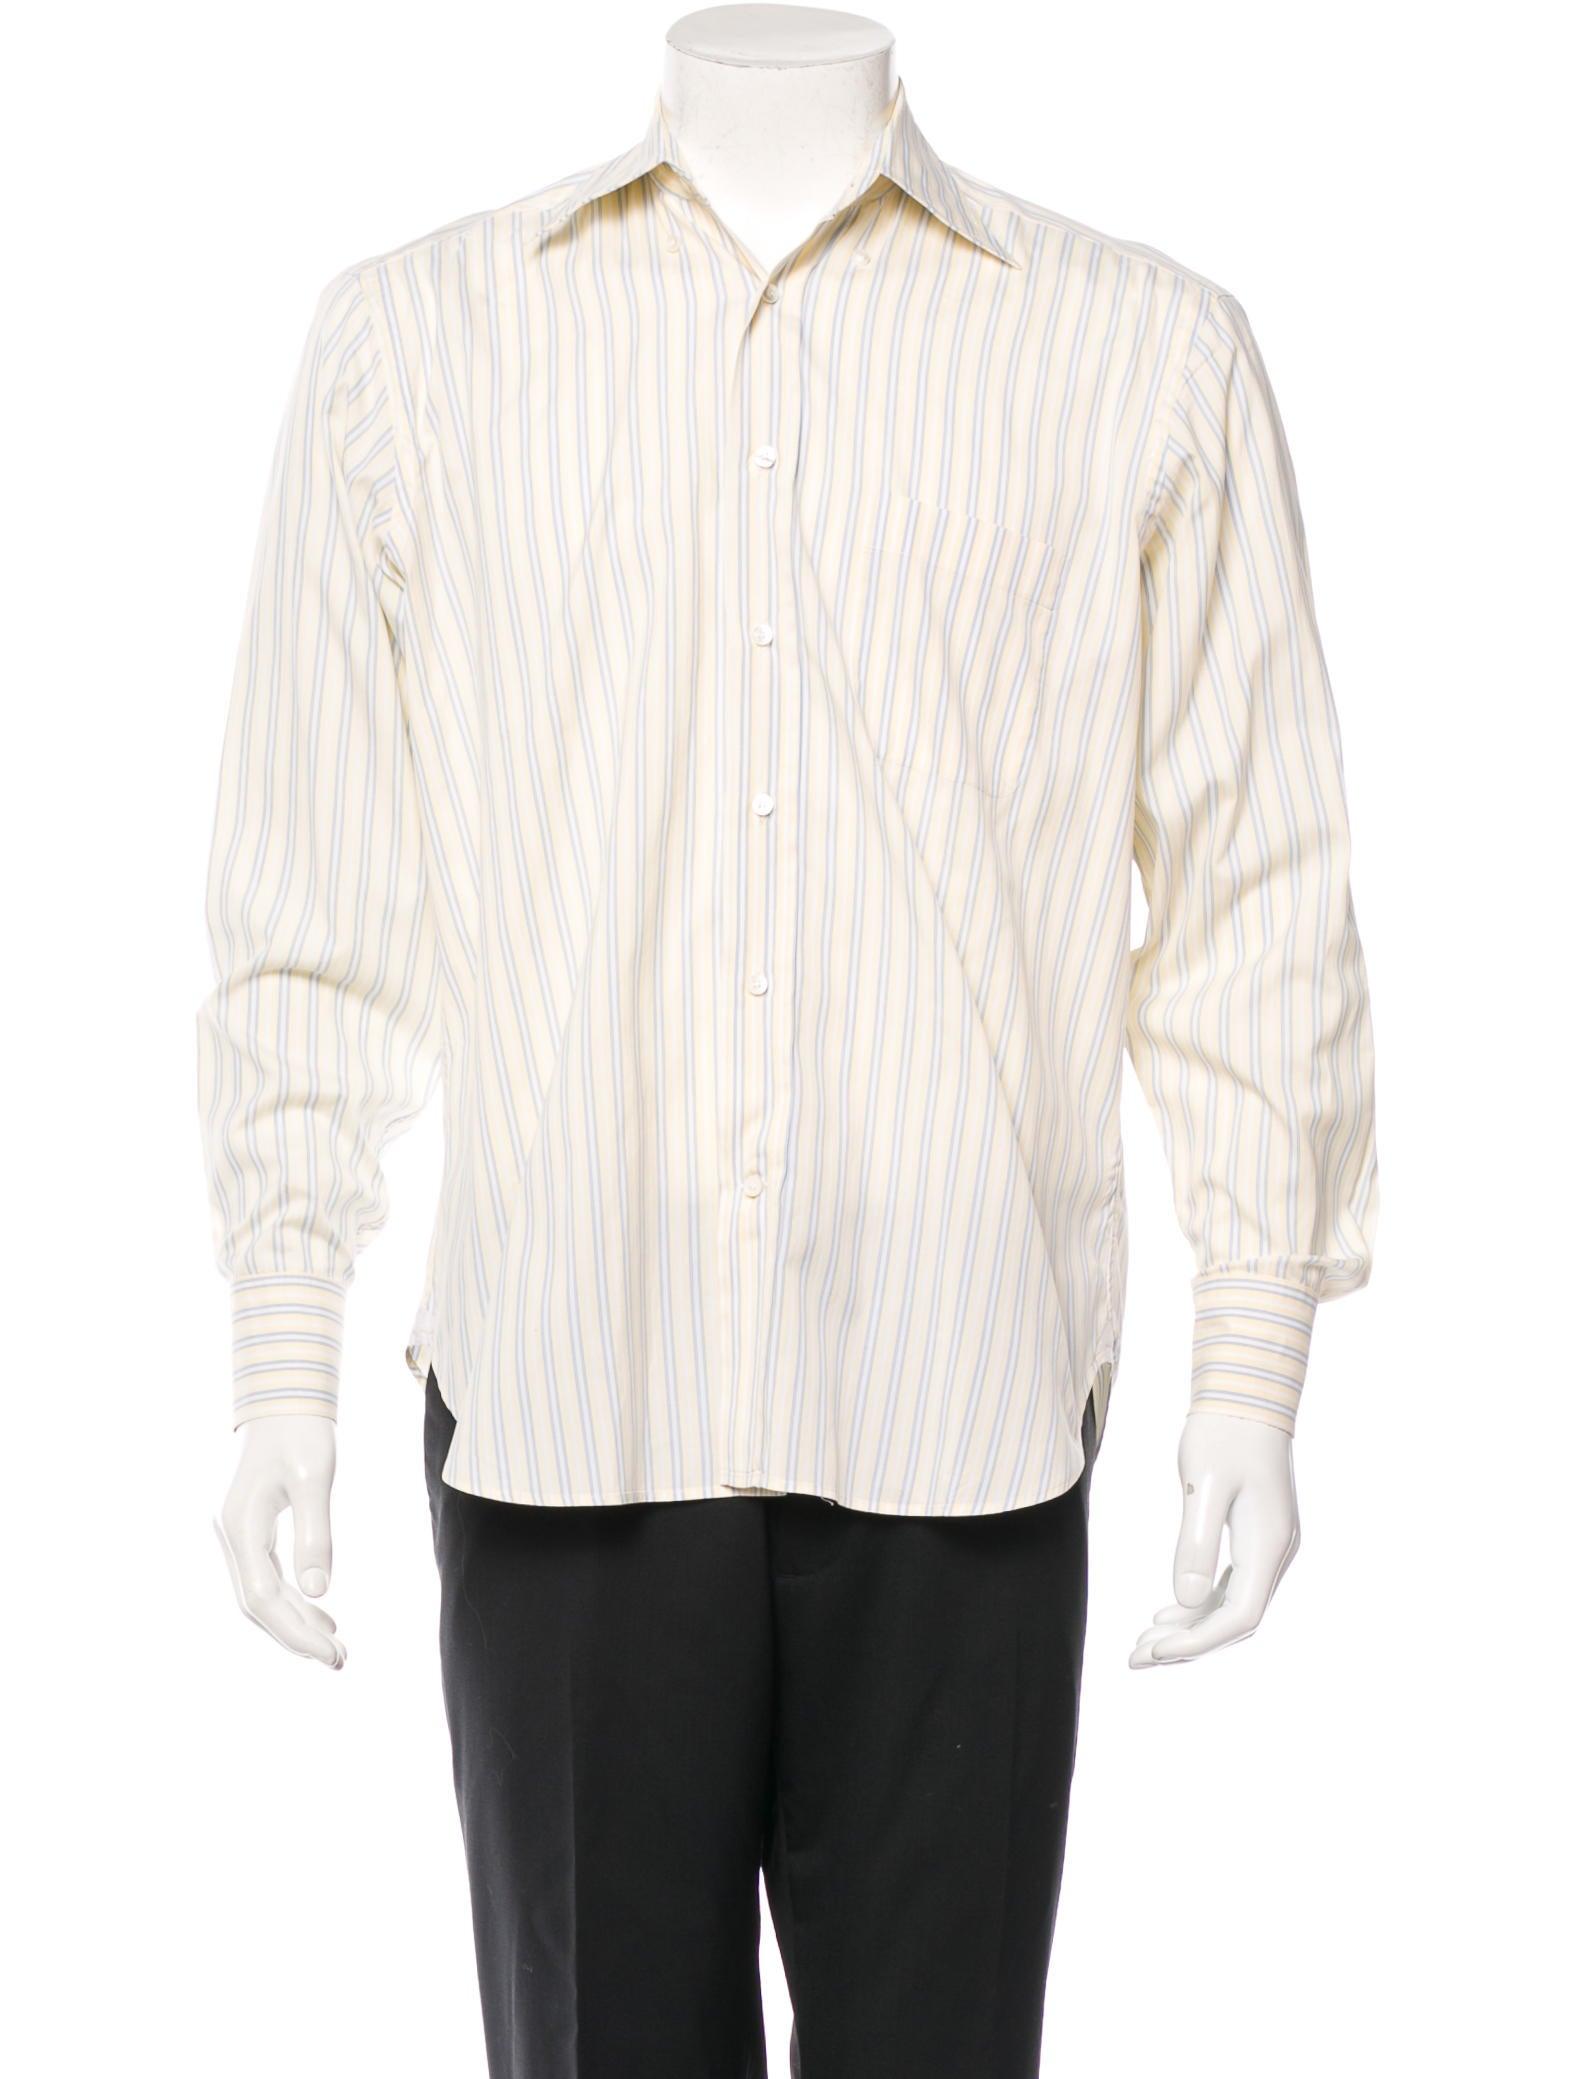 ermenegildo zegna button up shirt clothing zgn21606 the realreal. Black Bedroom Furniture Sets. Home Design Ideas